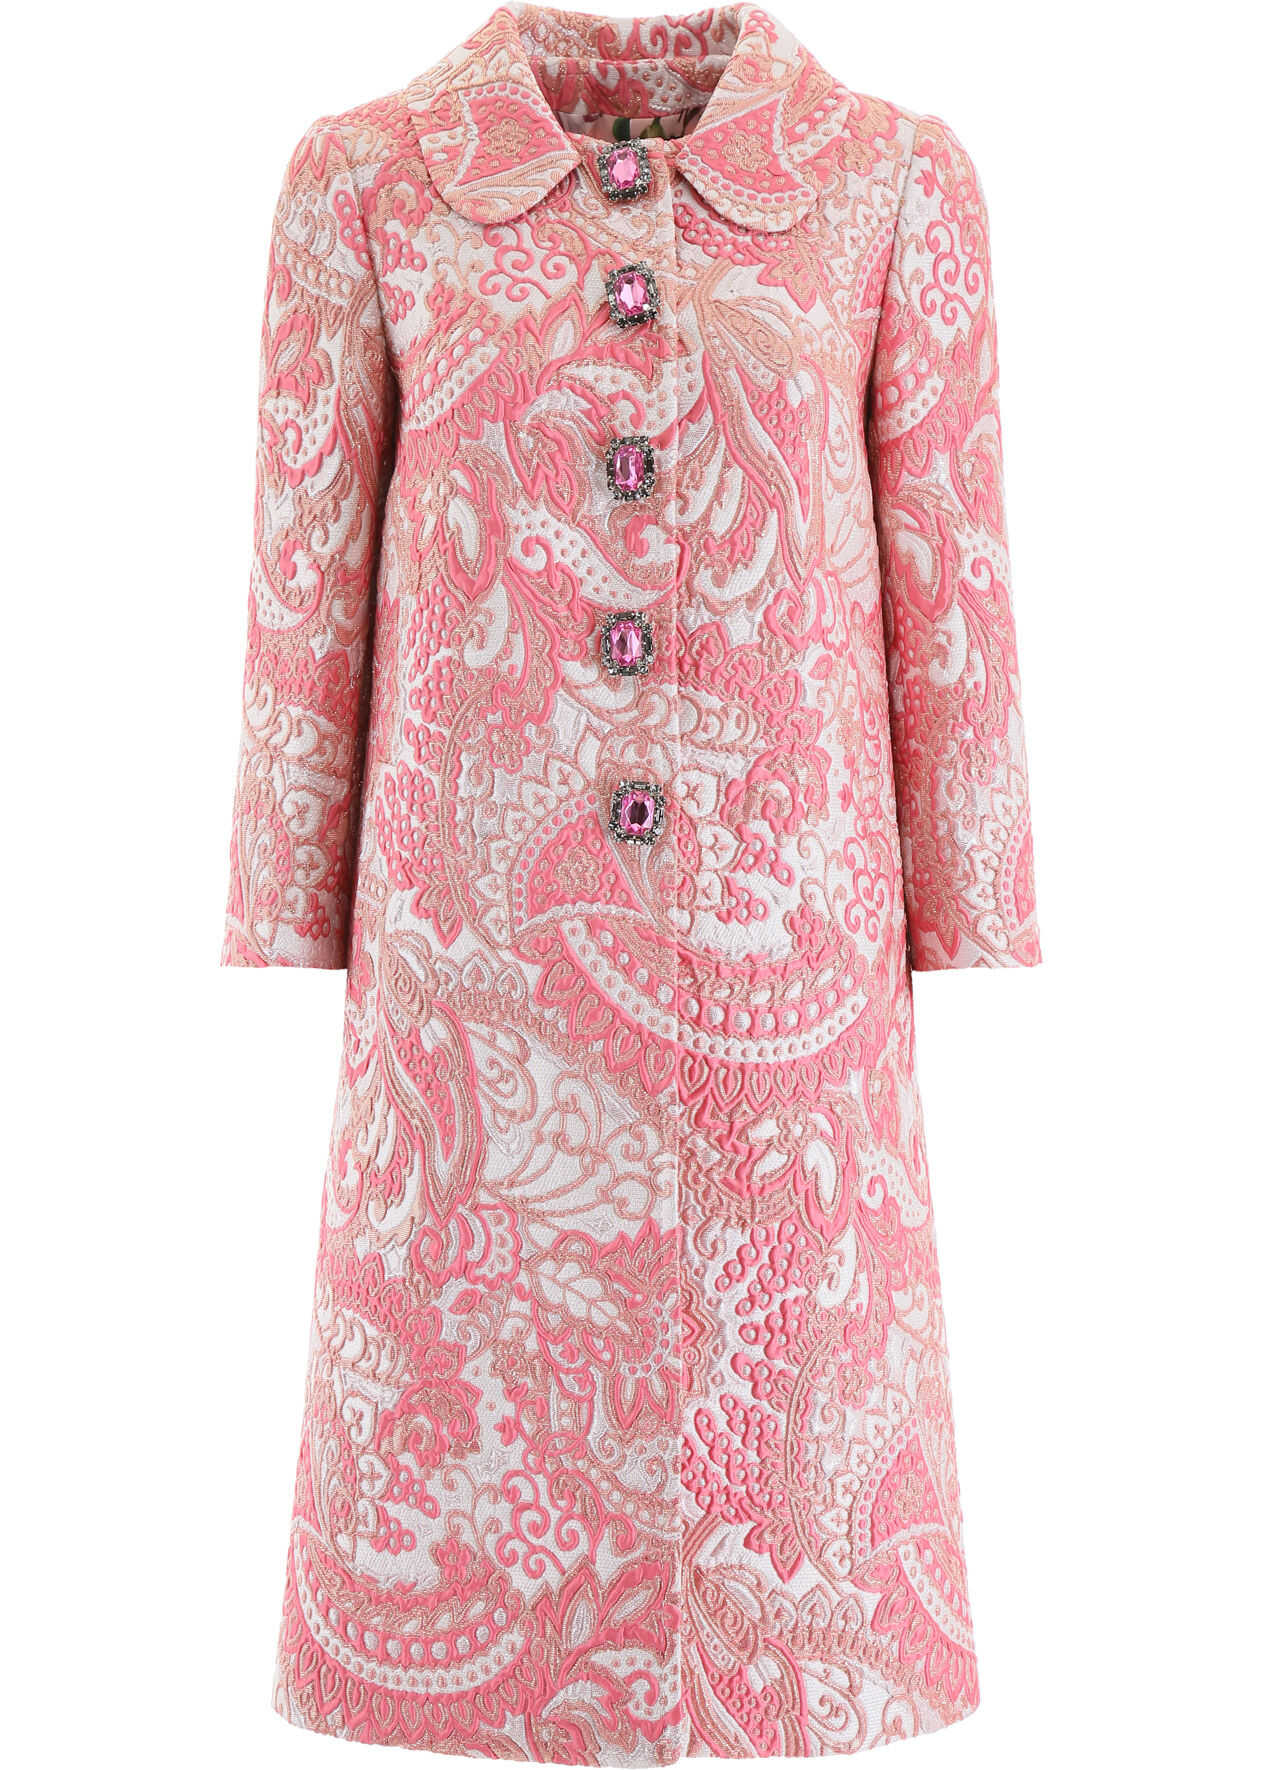 Dolce & Gabbana Lurex Jacquard Coat JACQUARD